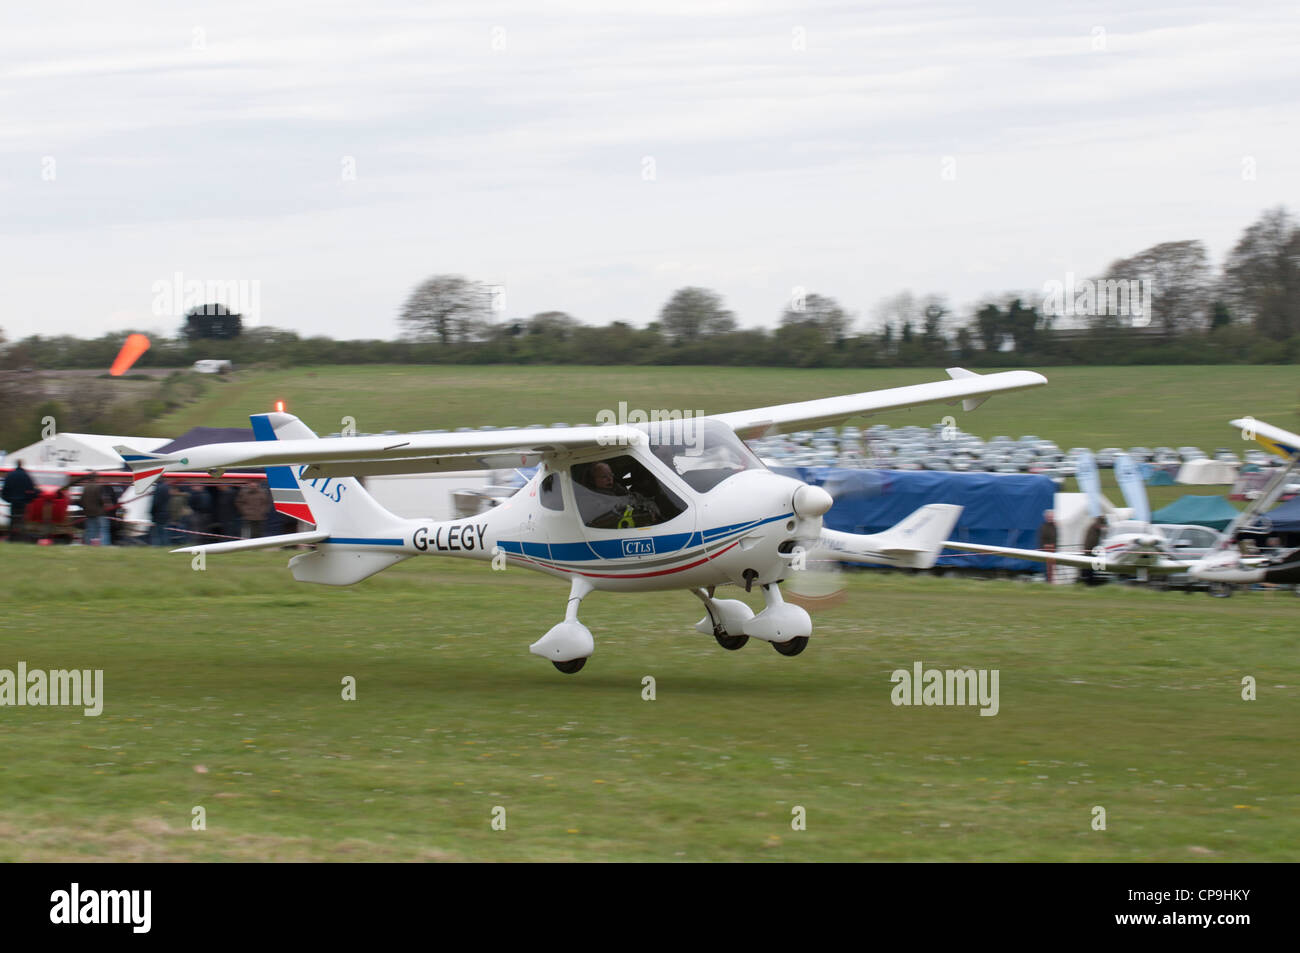 Flight Design GMBH CTLS  high wing light aircraft registration G-LEGY takes off from Popham airfield near Basingstoke - Stock Image